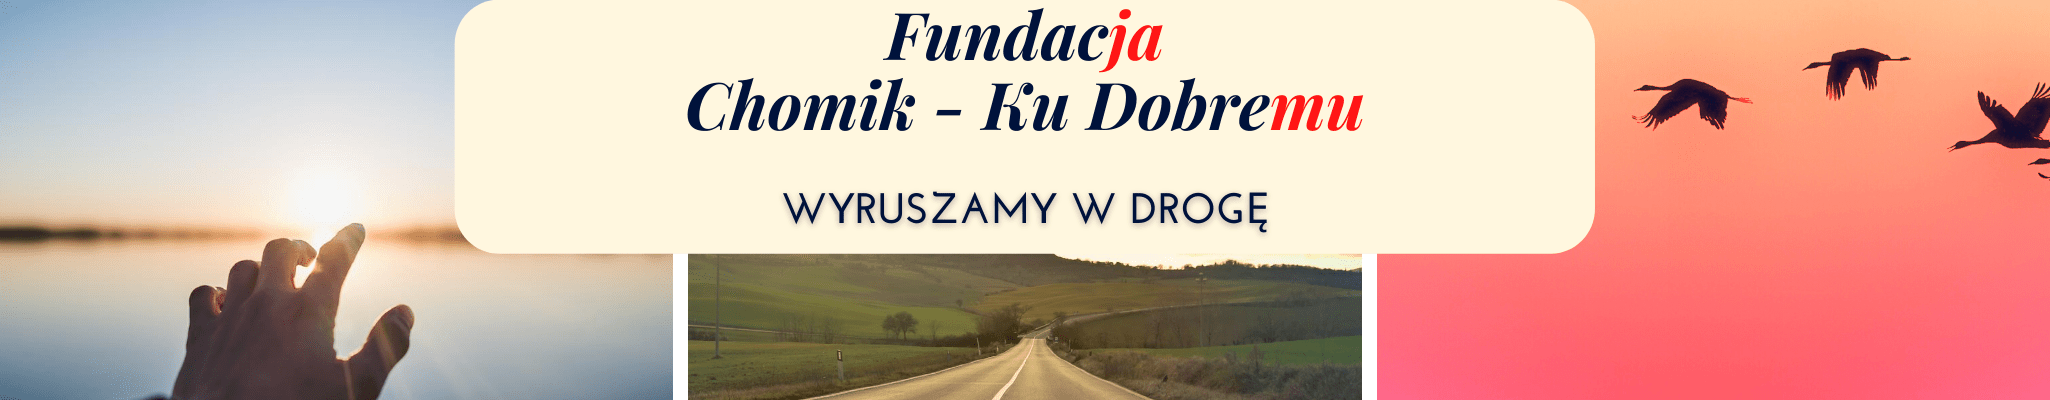 Fundacja Chomik – Ku Dobremu